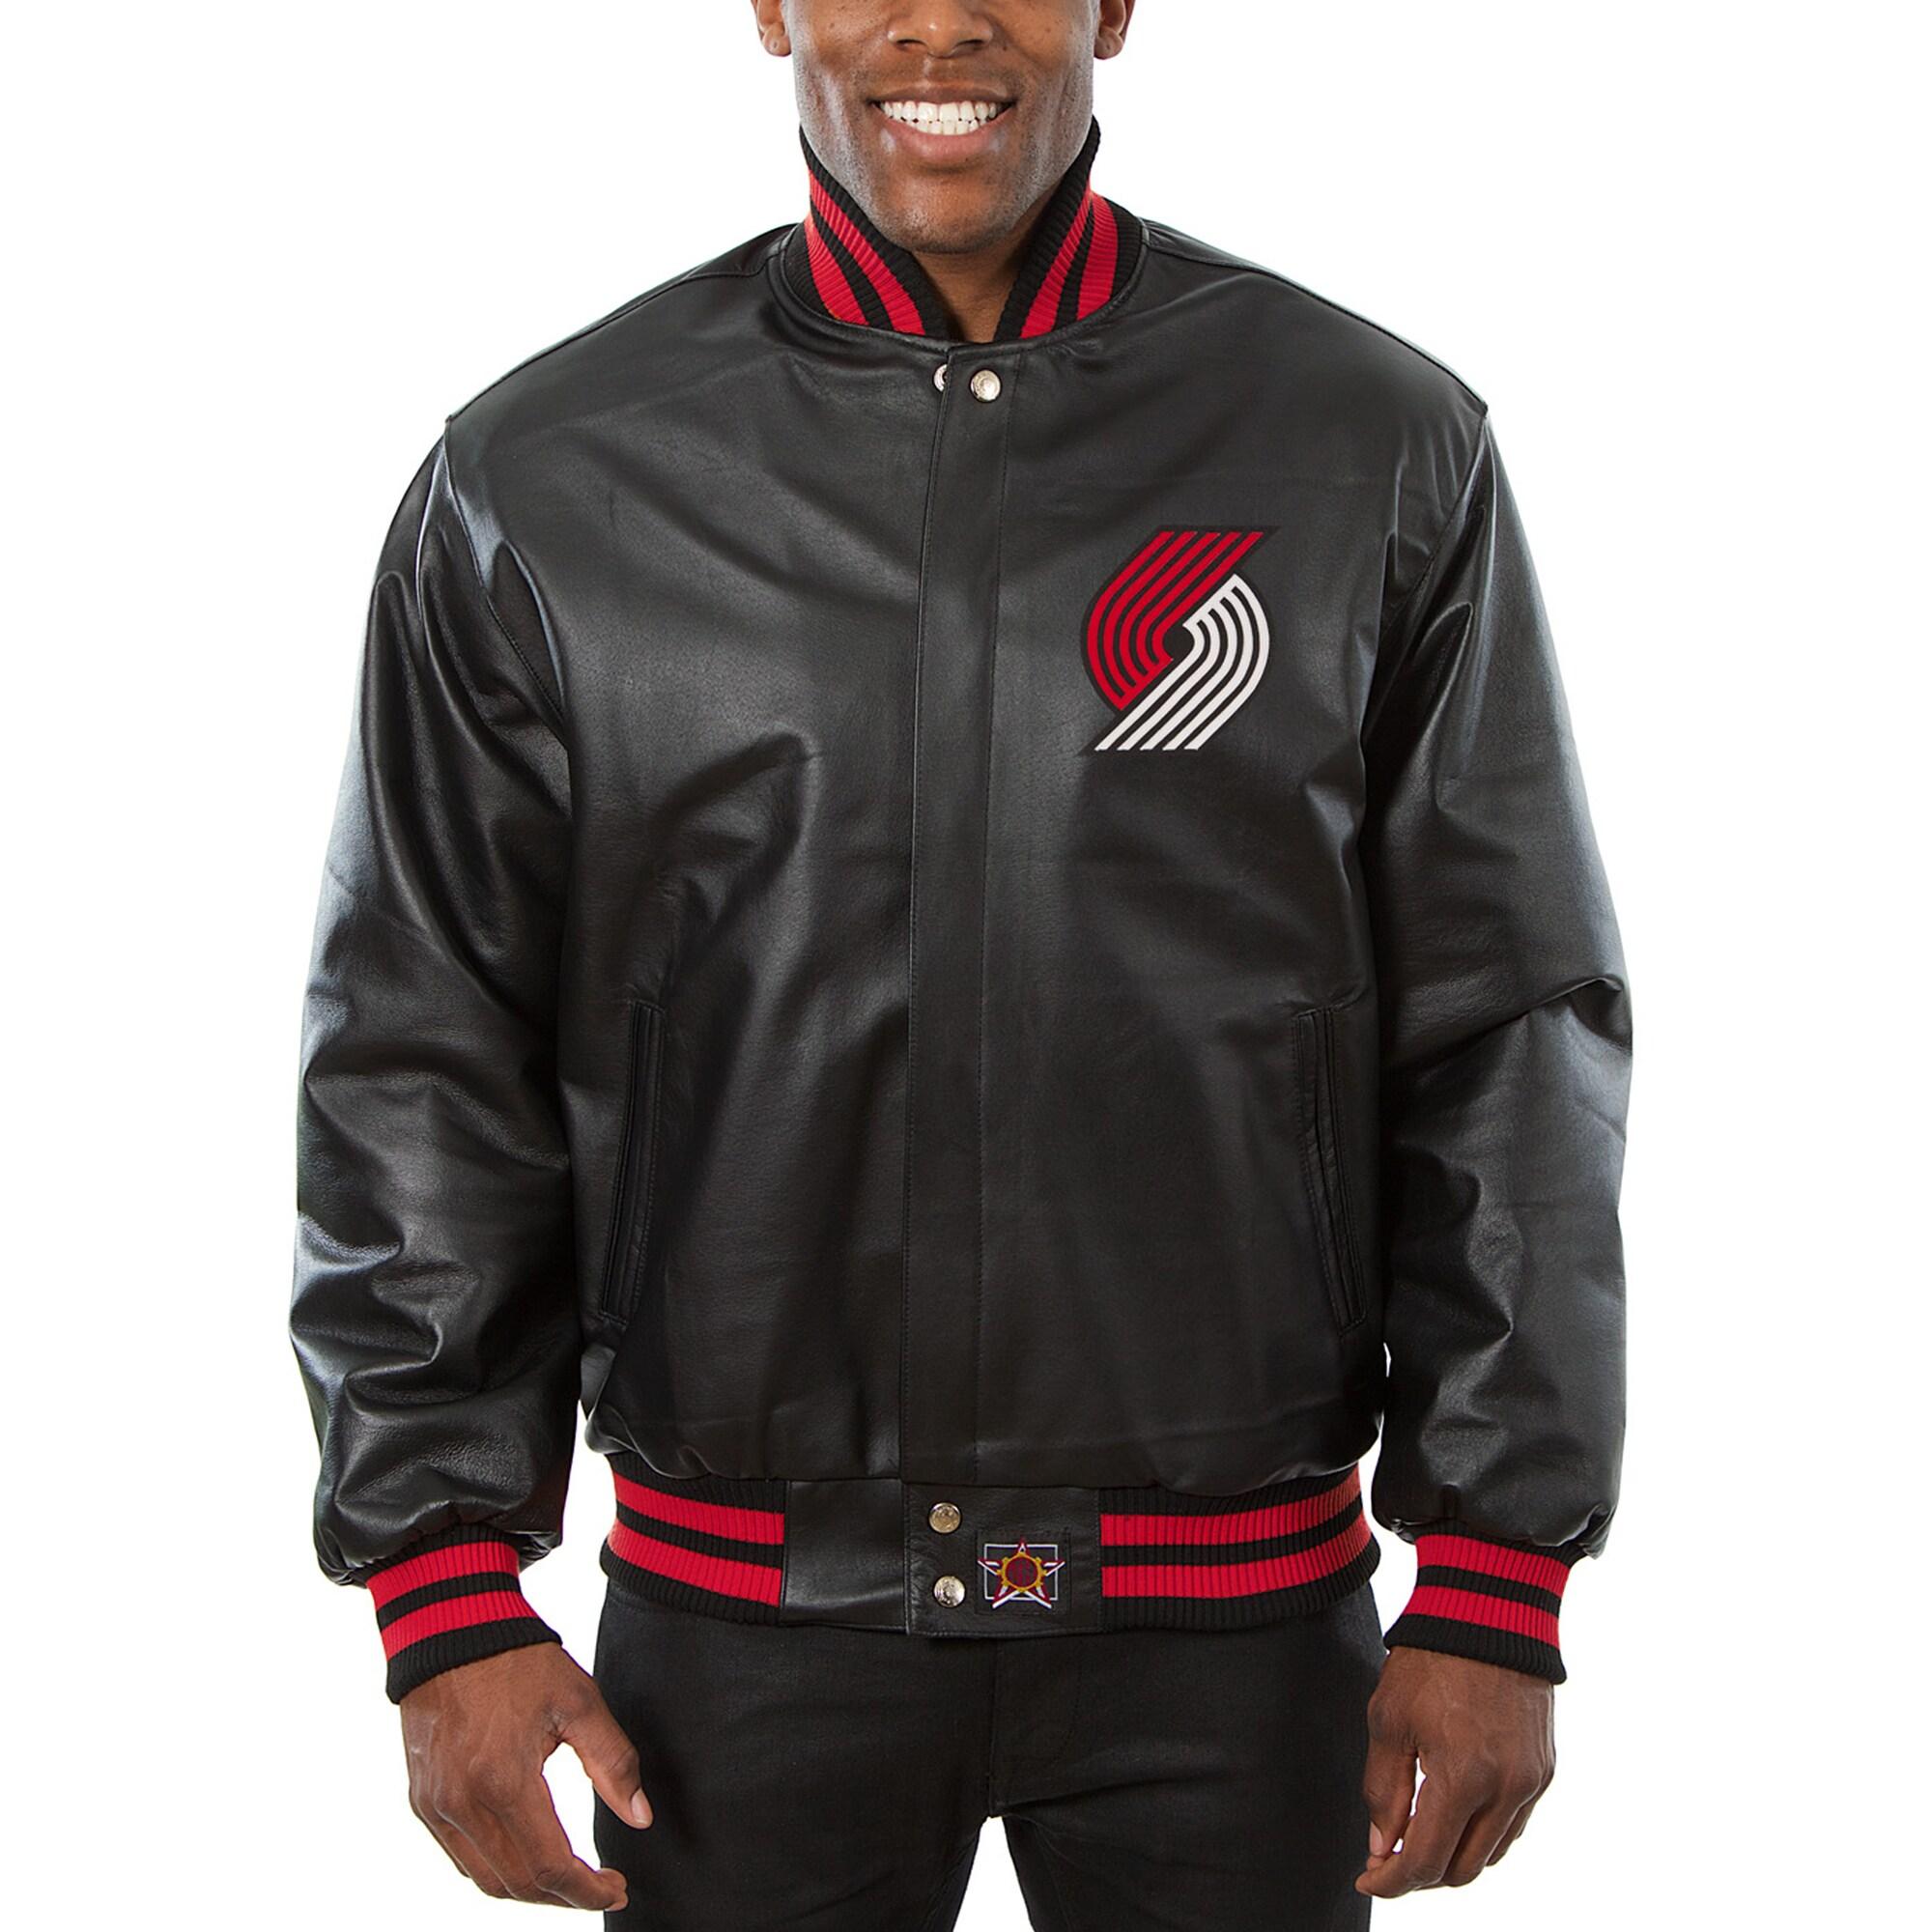 Portland Trail Blazers JH Design Big & Tall All-Leather Full-Snap Jacket - Black